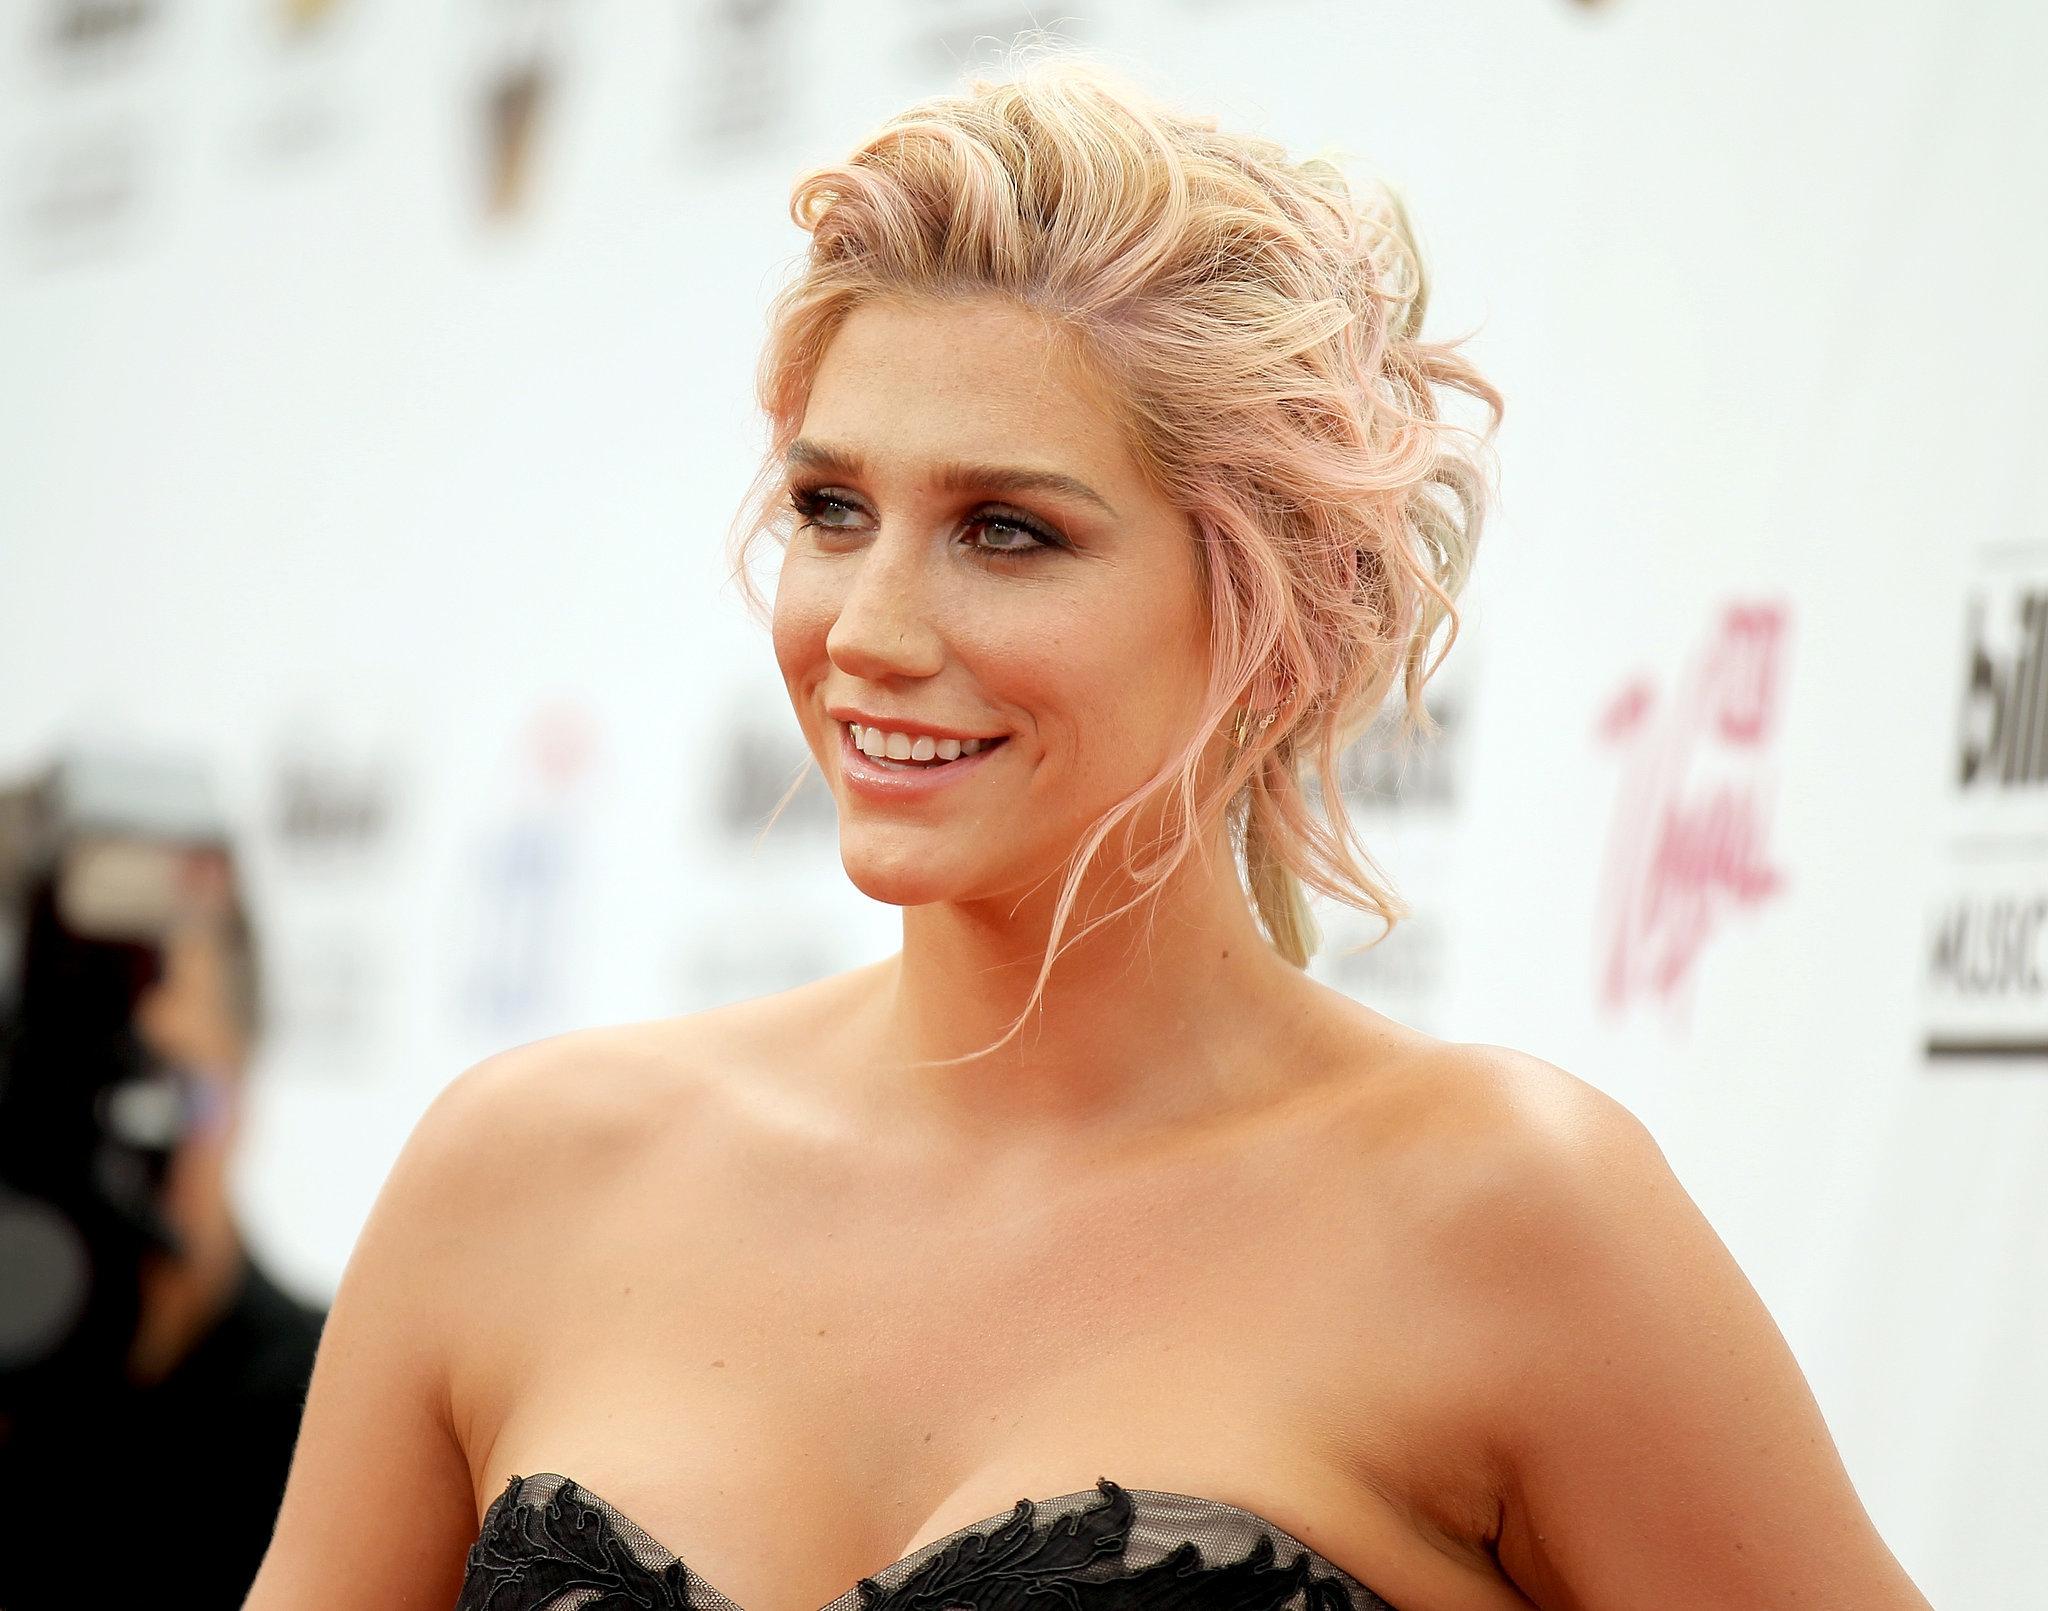 Kesha Profile, BioData, Updates and Latest Pictures